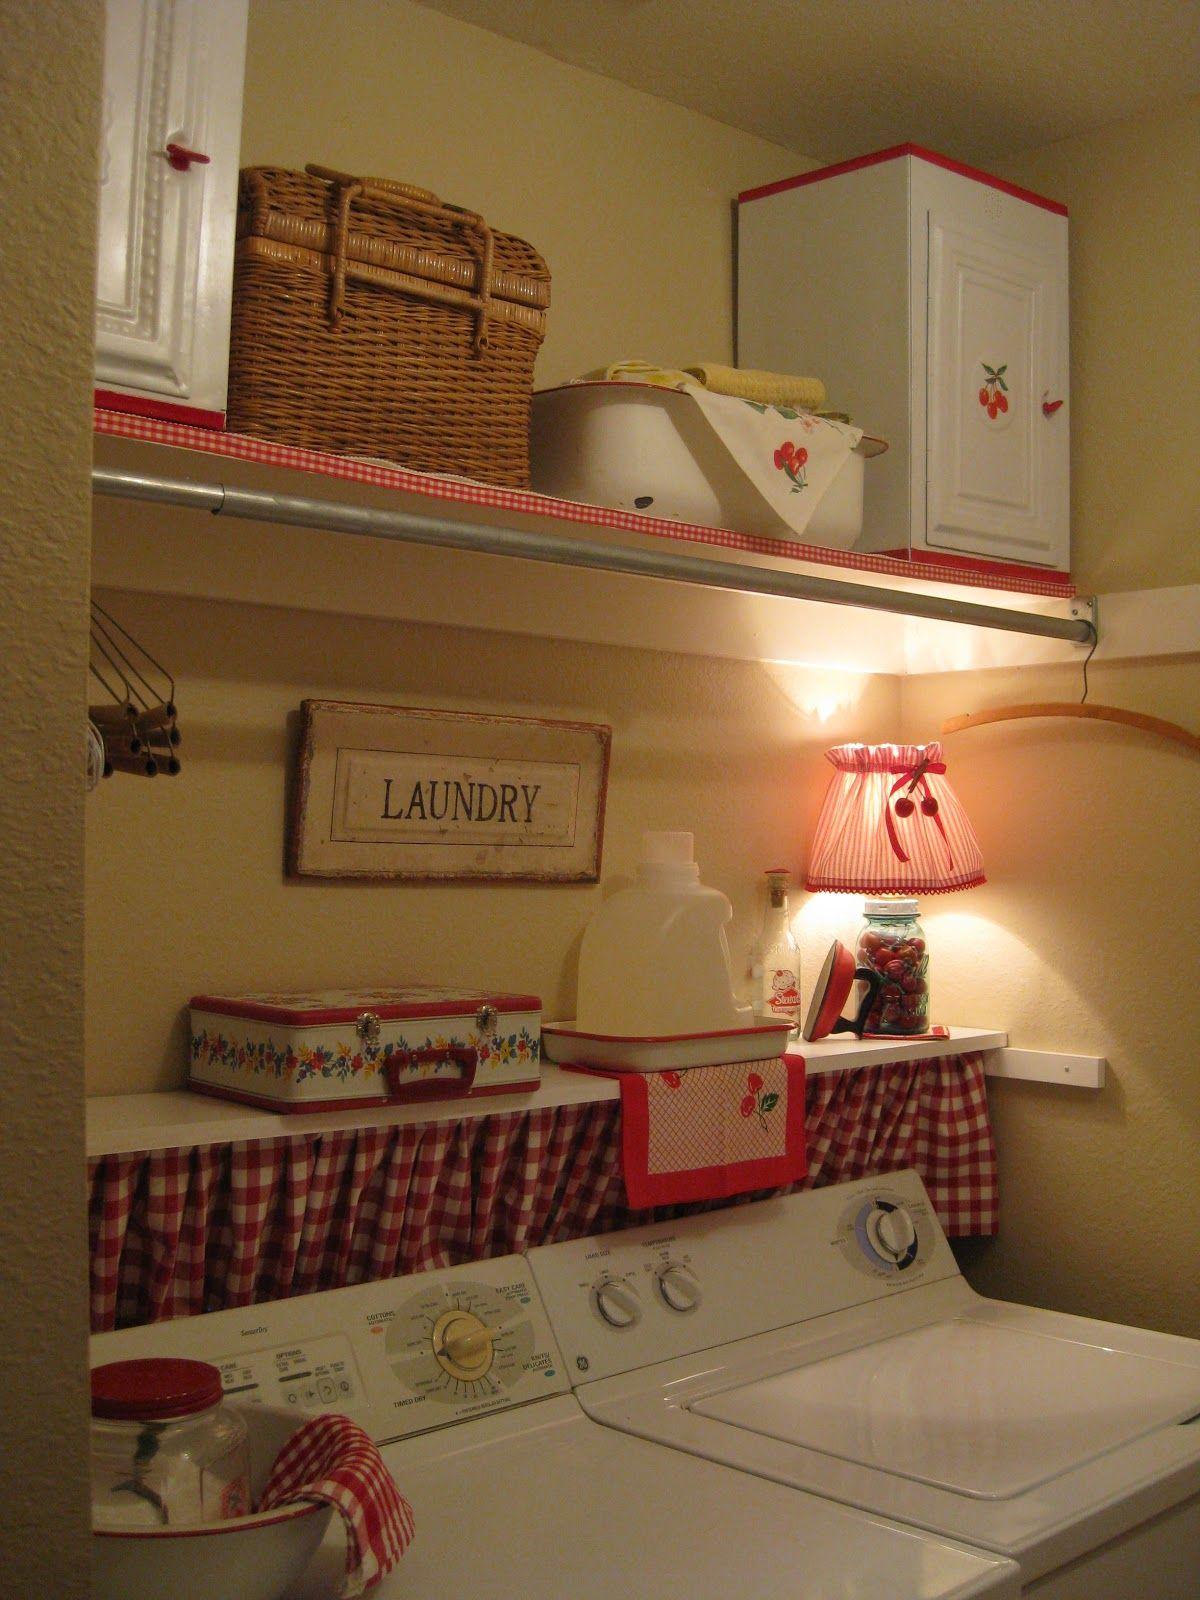 Brookhollow Lane: Laundry Room Fix Up